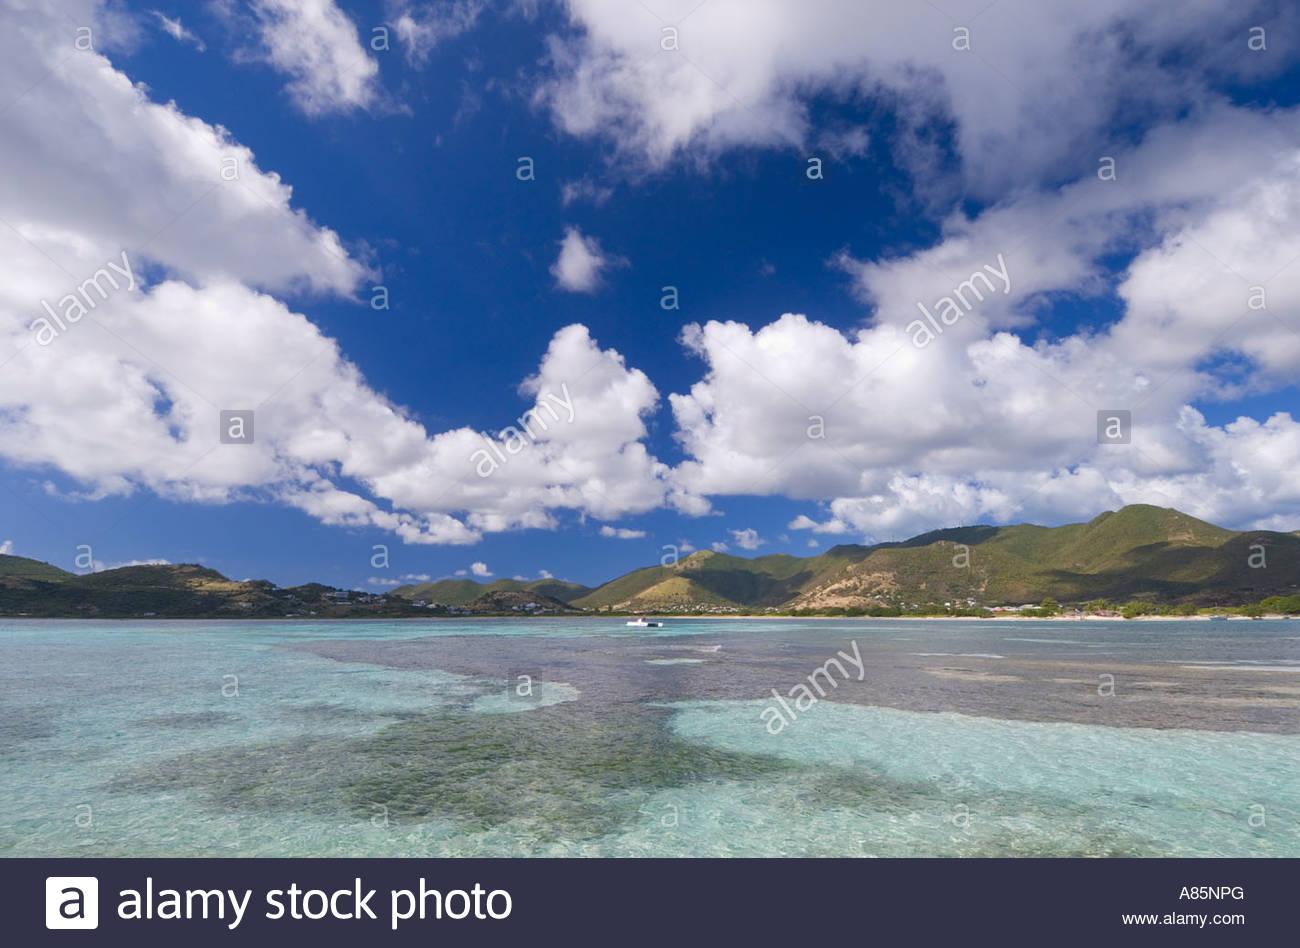 Le Galion Beach, Saint Martin, French Antilles, Caribbean - Stock Image